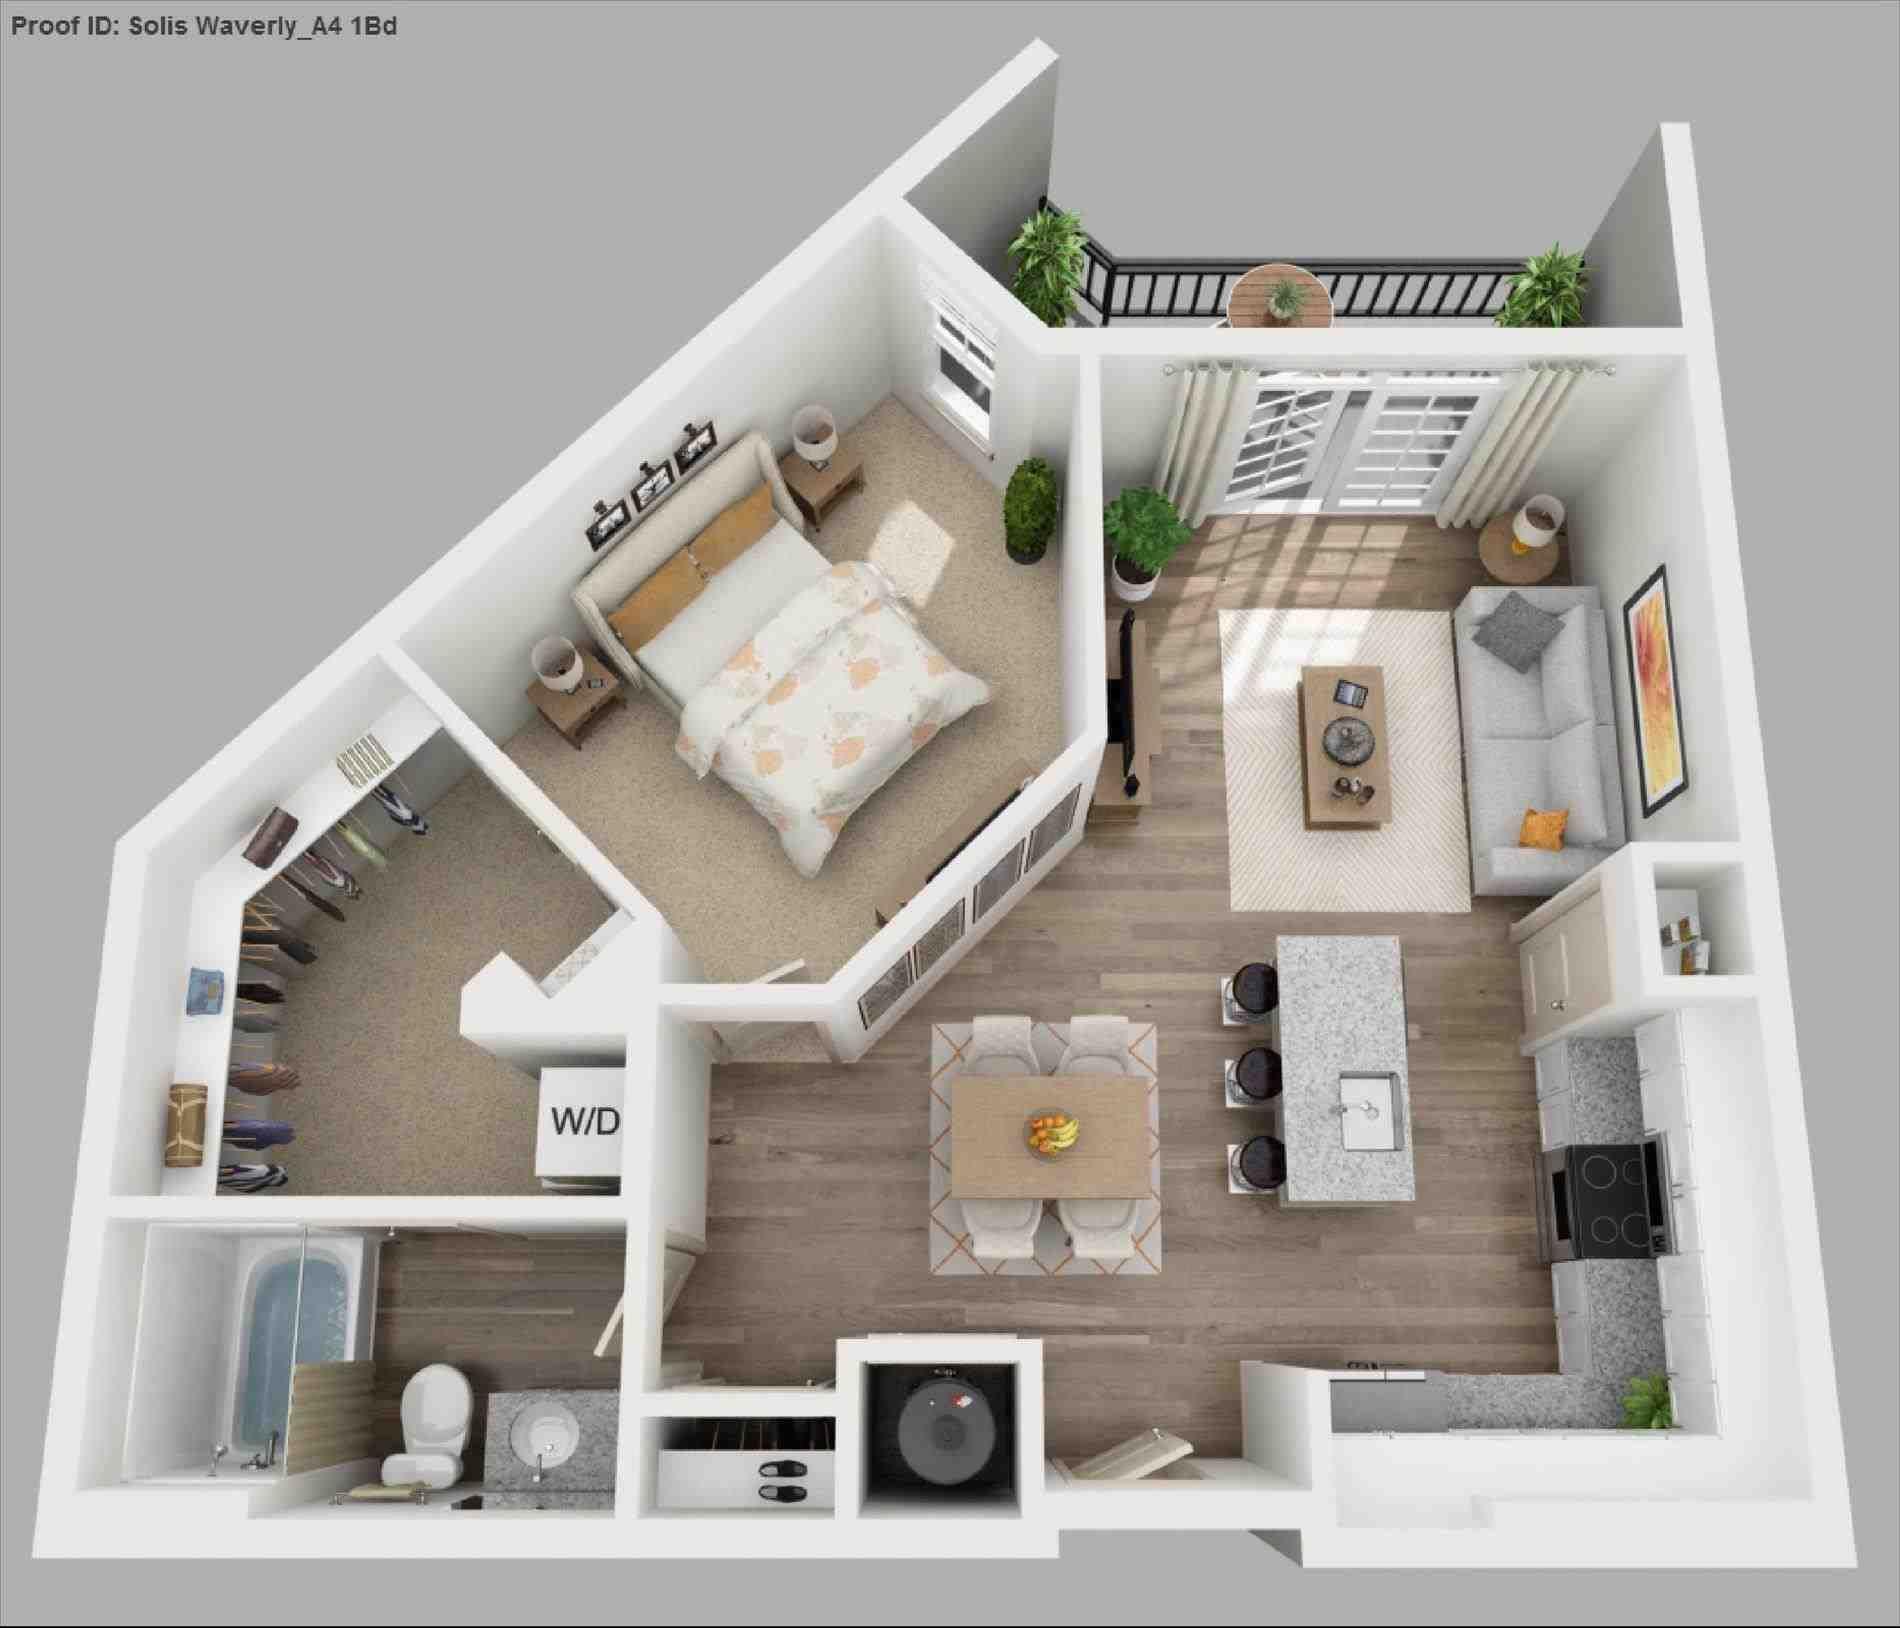 Design Apartment 1 Bedroom Sims House Plans Apartment Floor